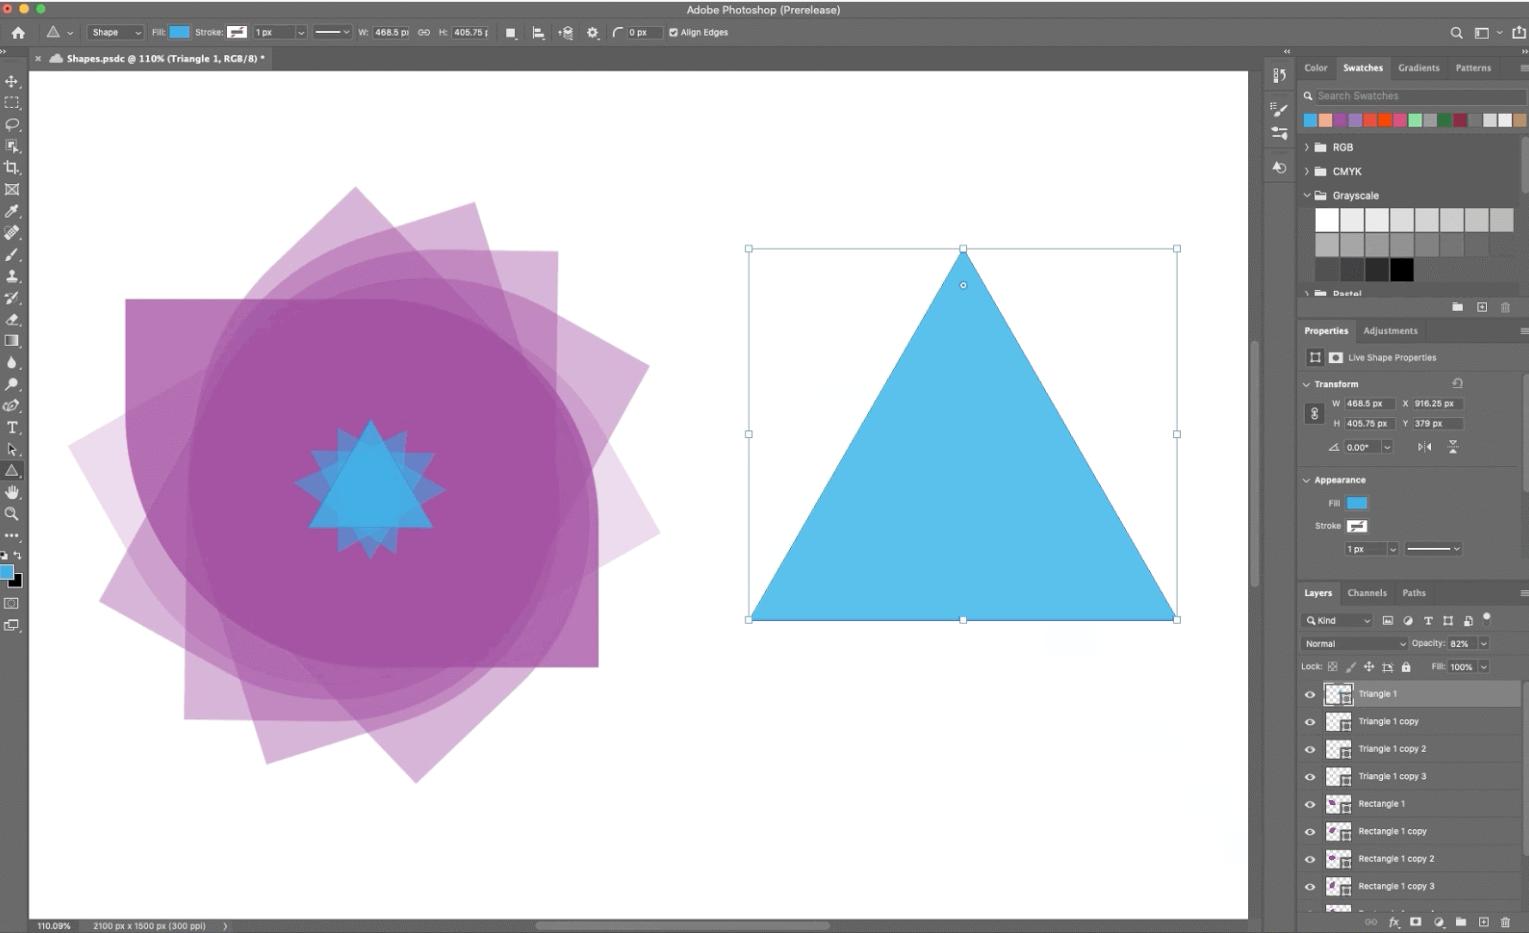 The Adobe Photoshop system.